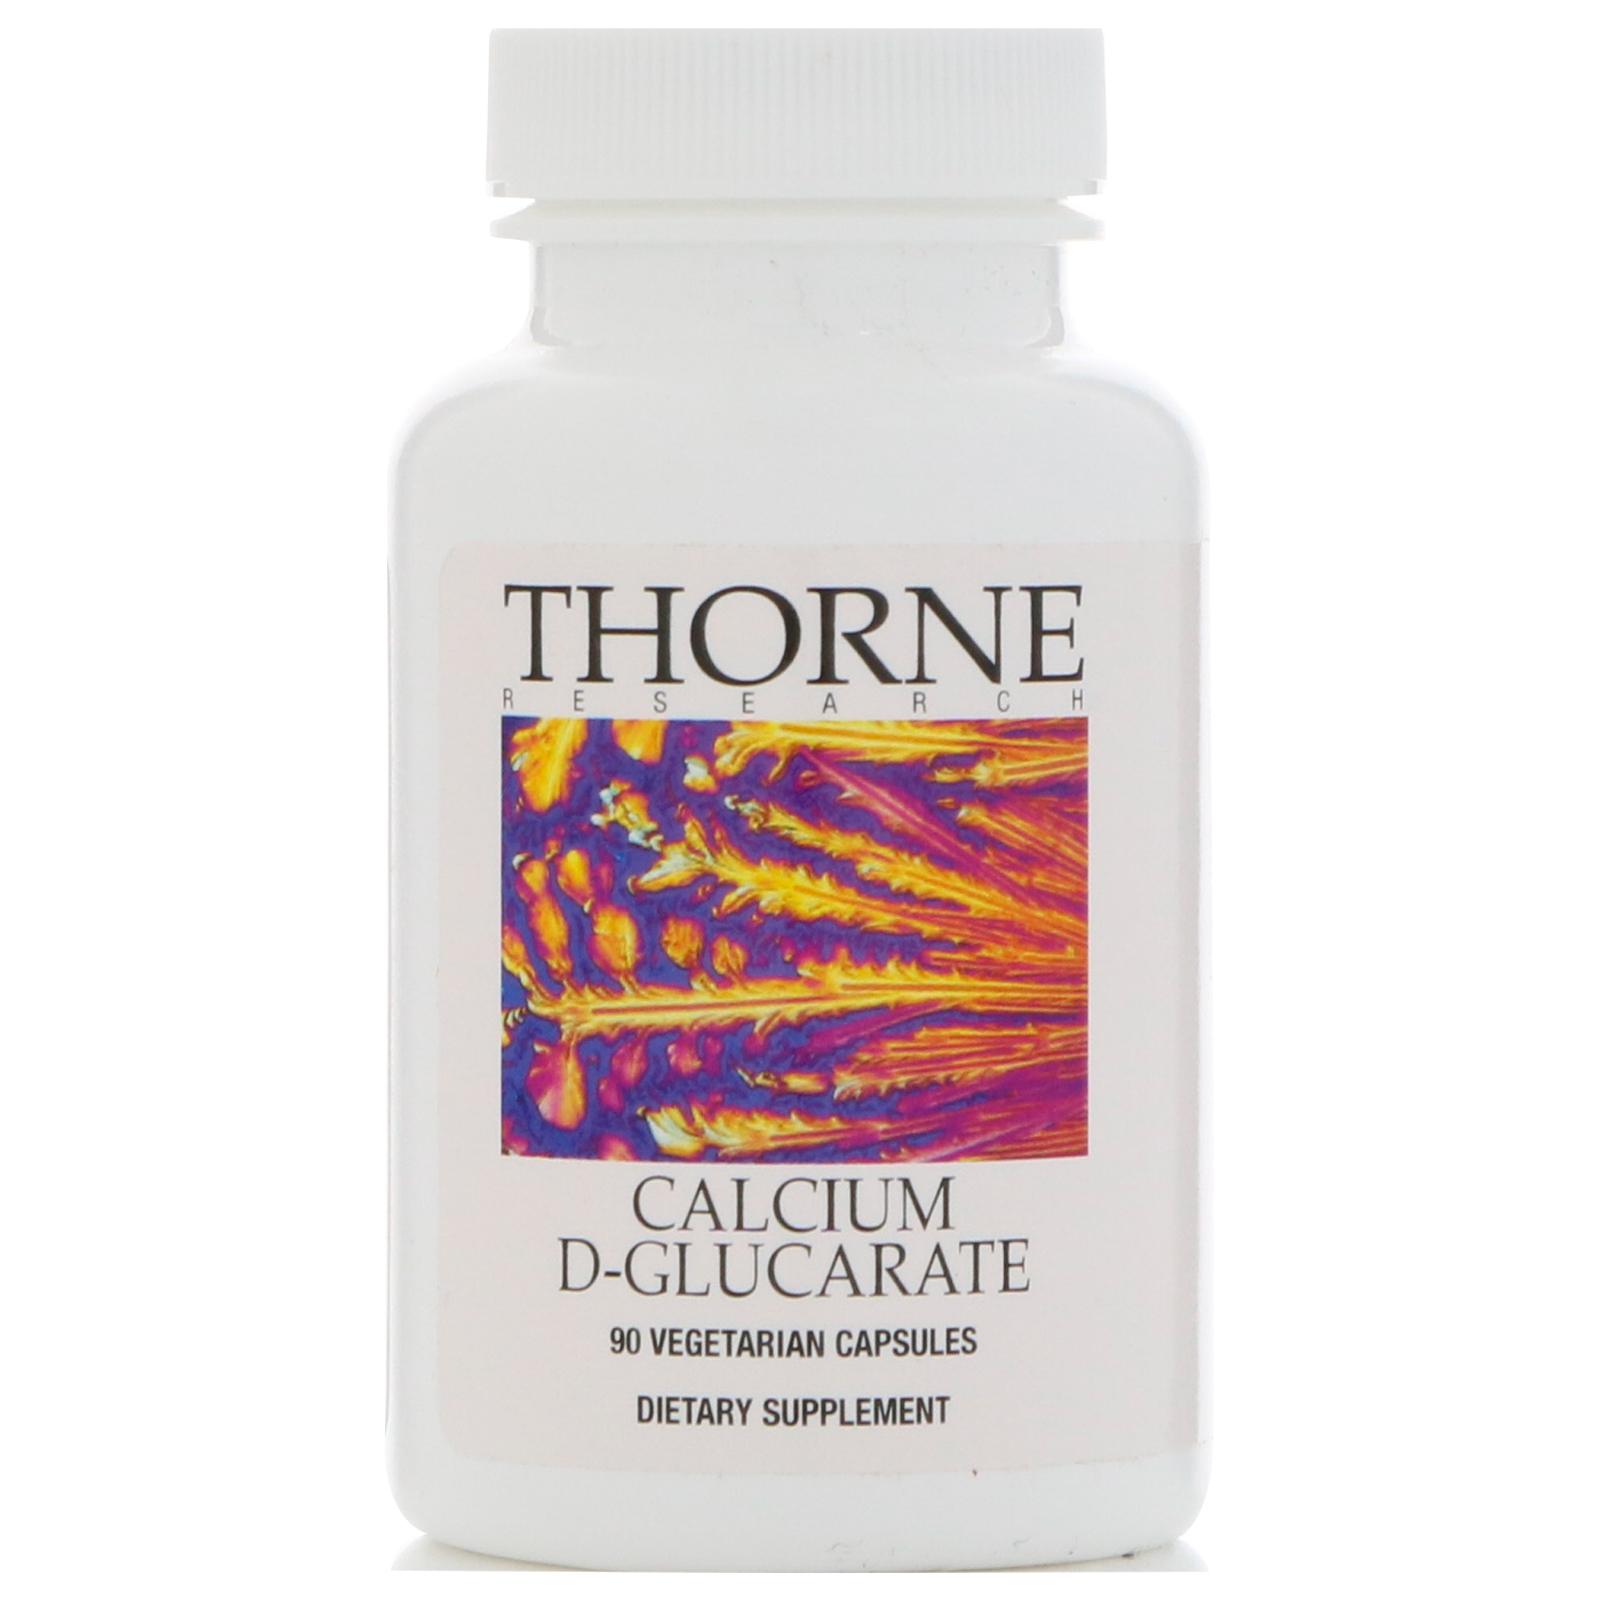 Thorne Research, Calcium D-Glucarate, 90 Vegetarian Capsules